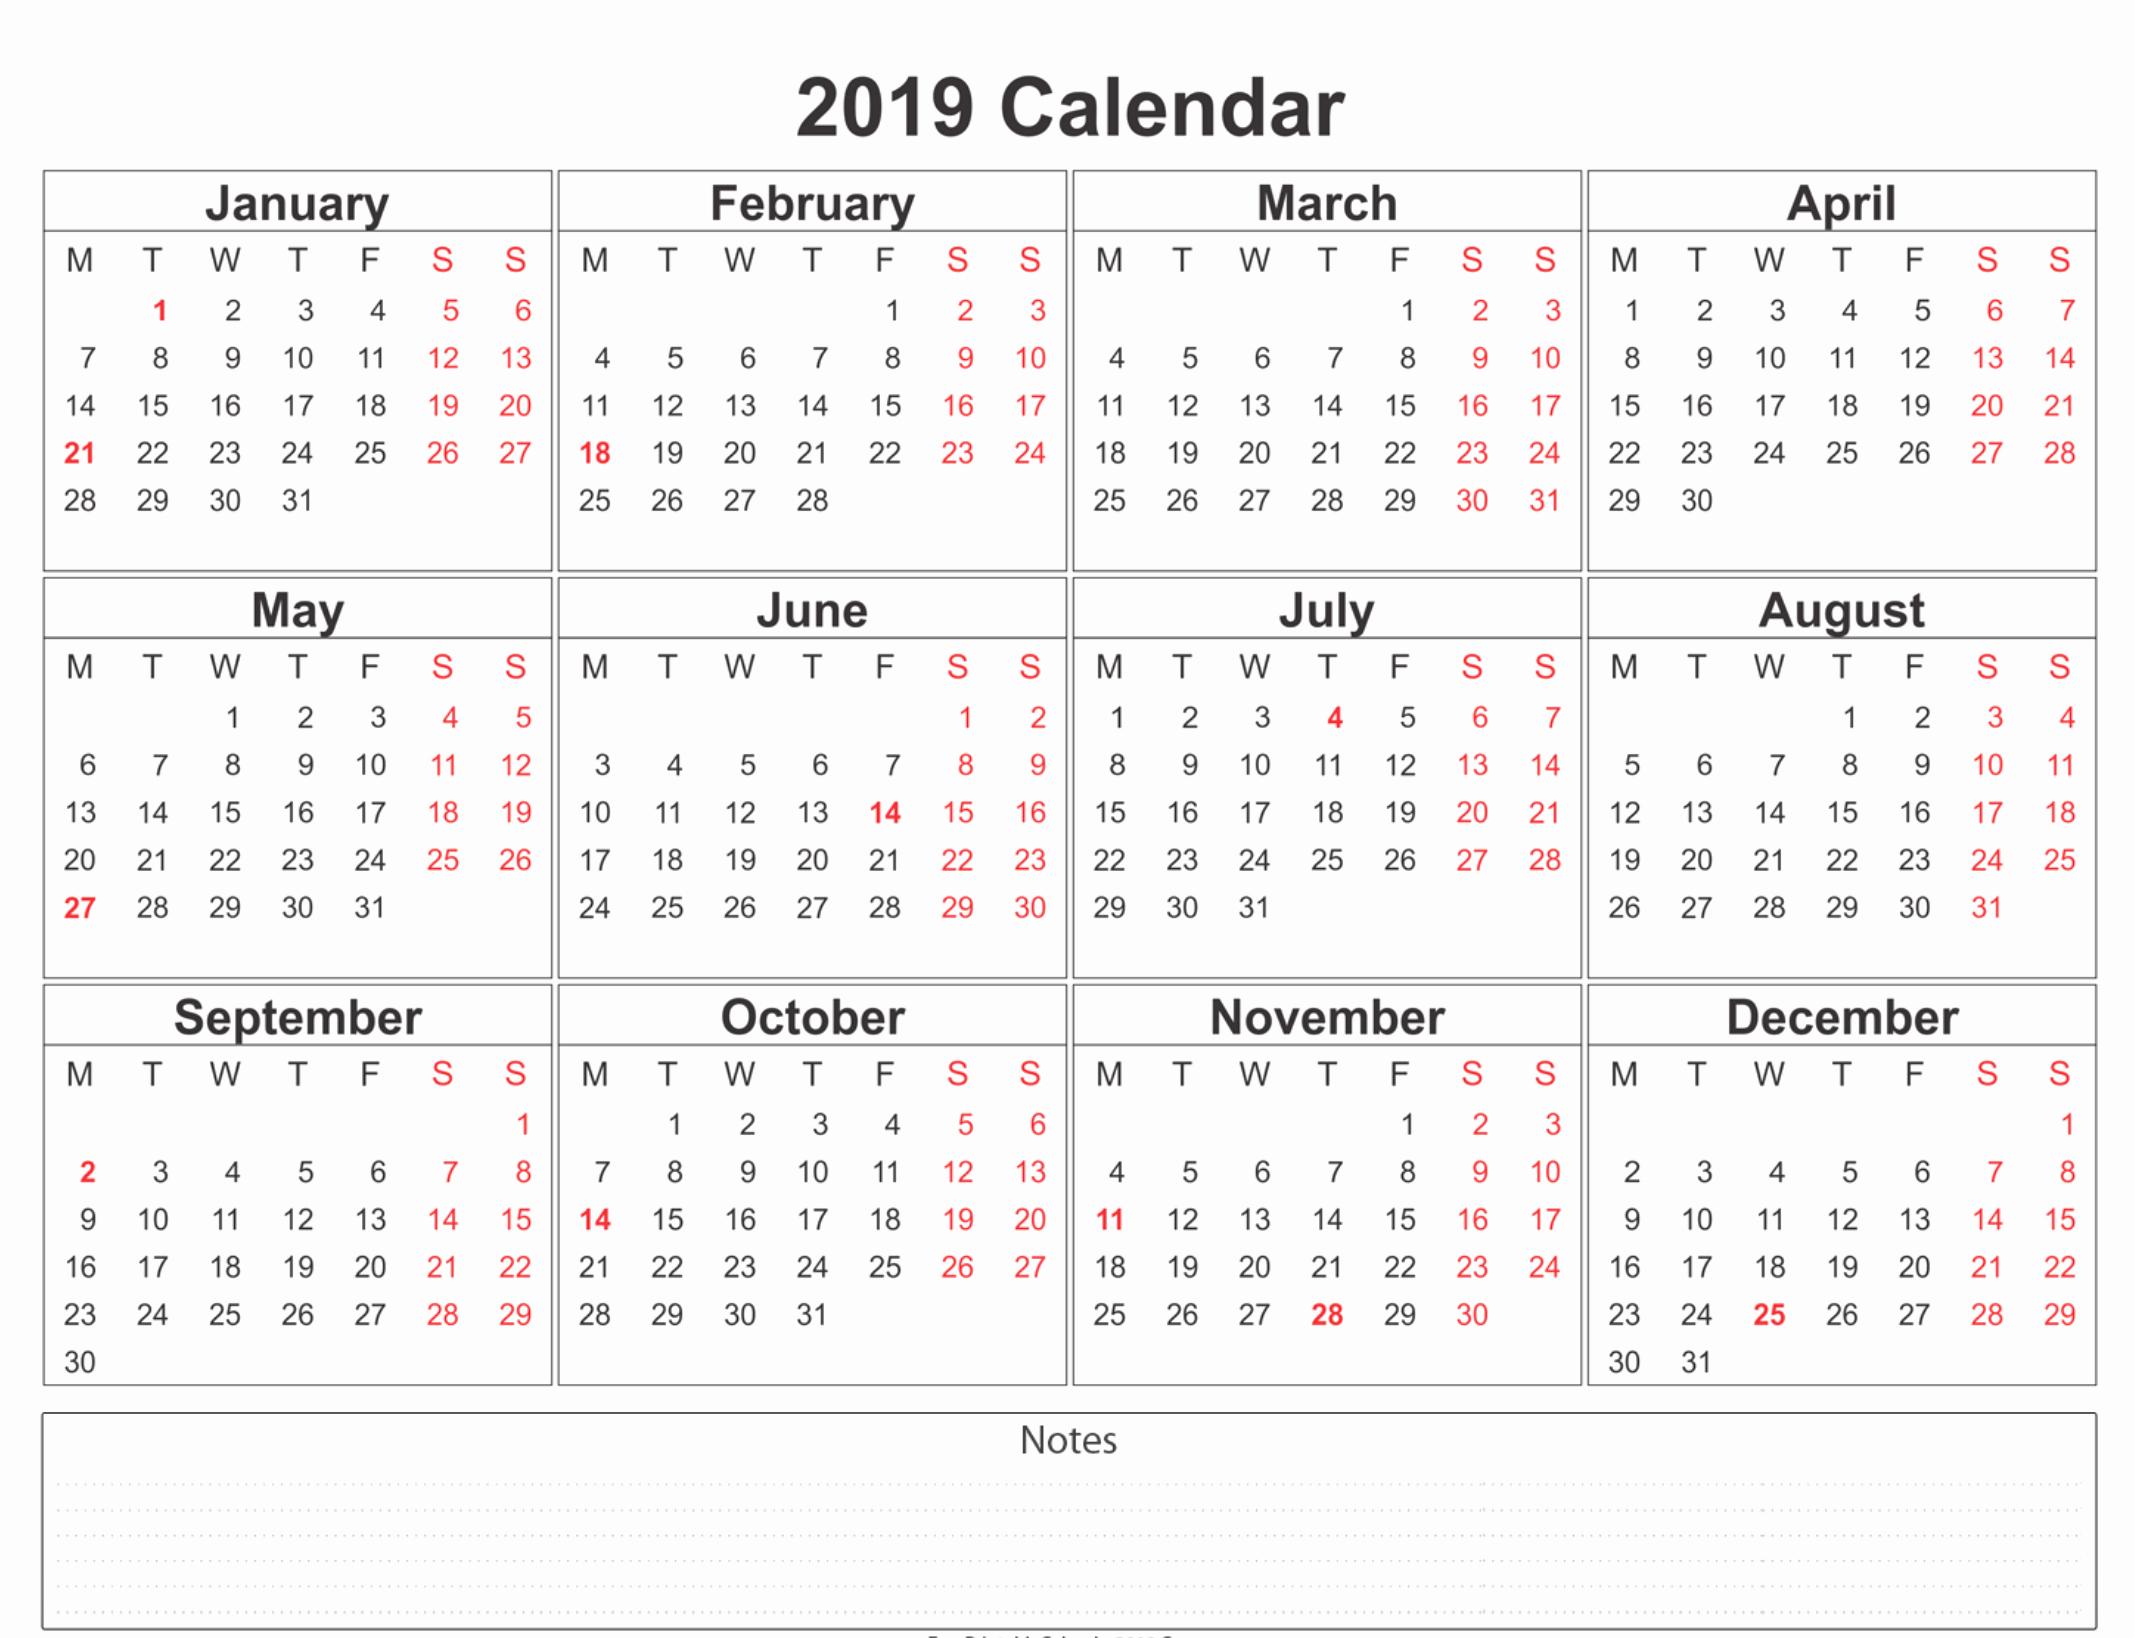 Free 2019 Calendar Template Best Of 2019 Calendar Amazonaws